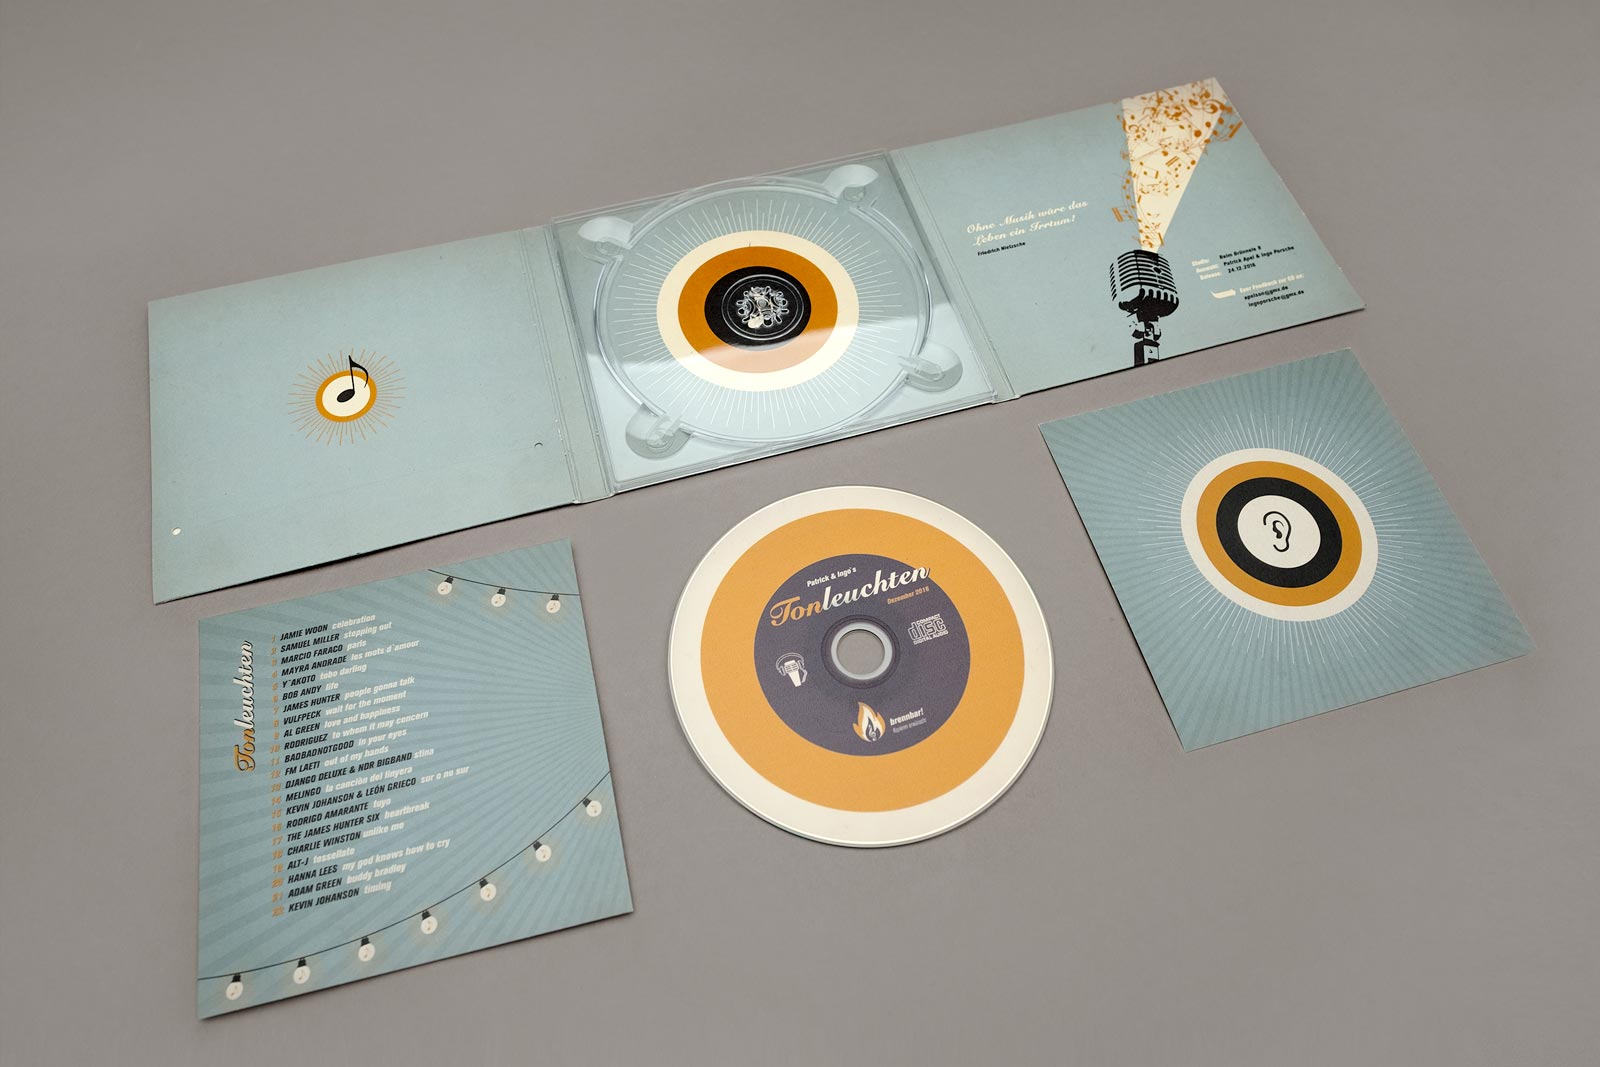 Tonleuchten, Compilation, CD Cover, Booklet, CD-Label, Cover Artwork, Innenansicht, Arrangement